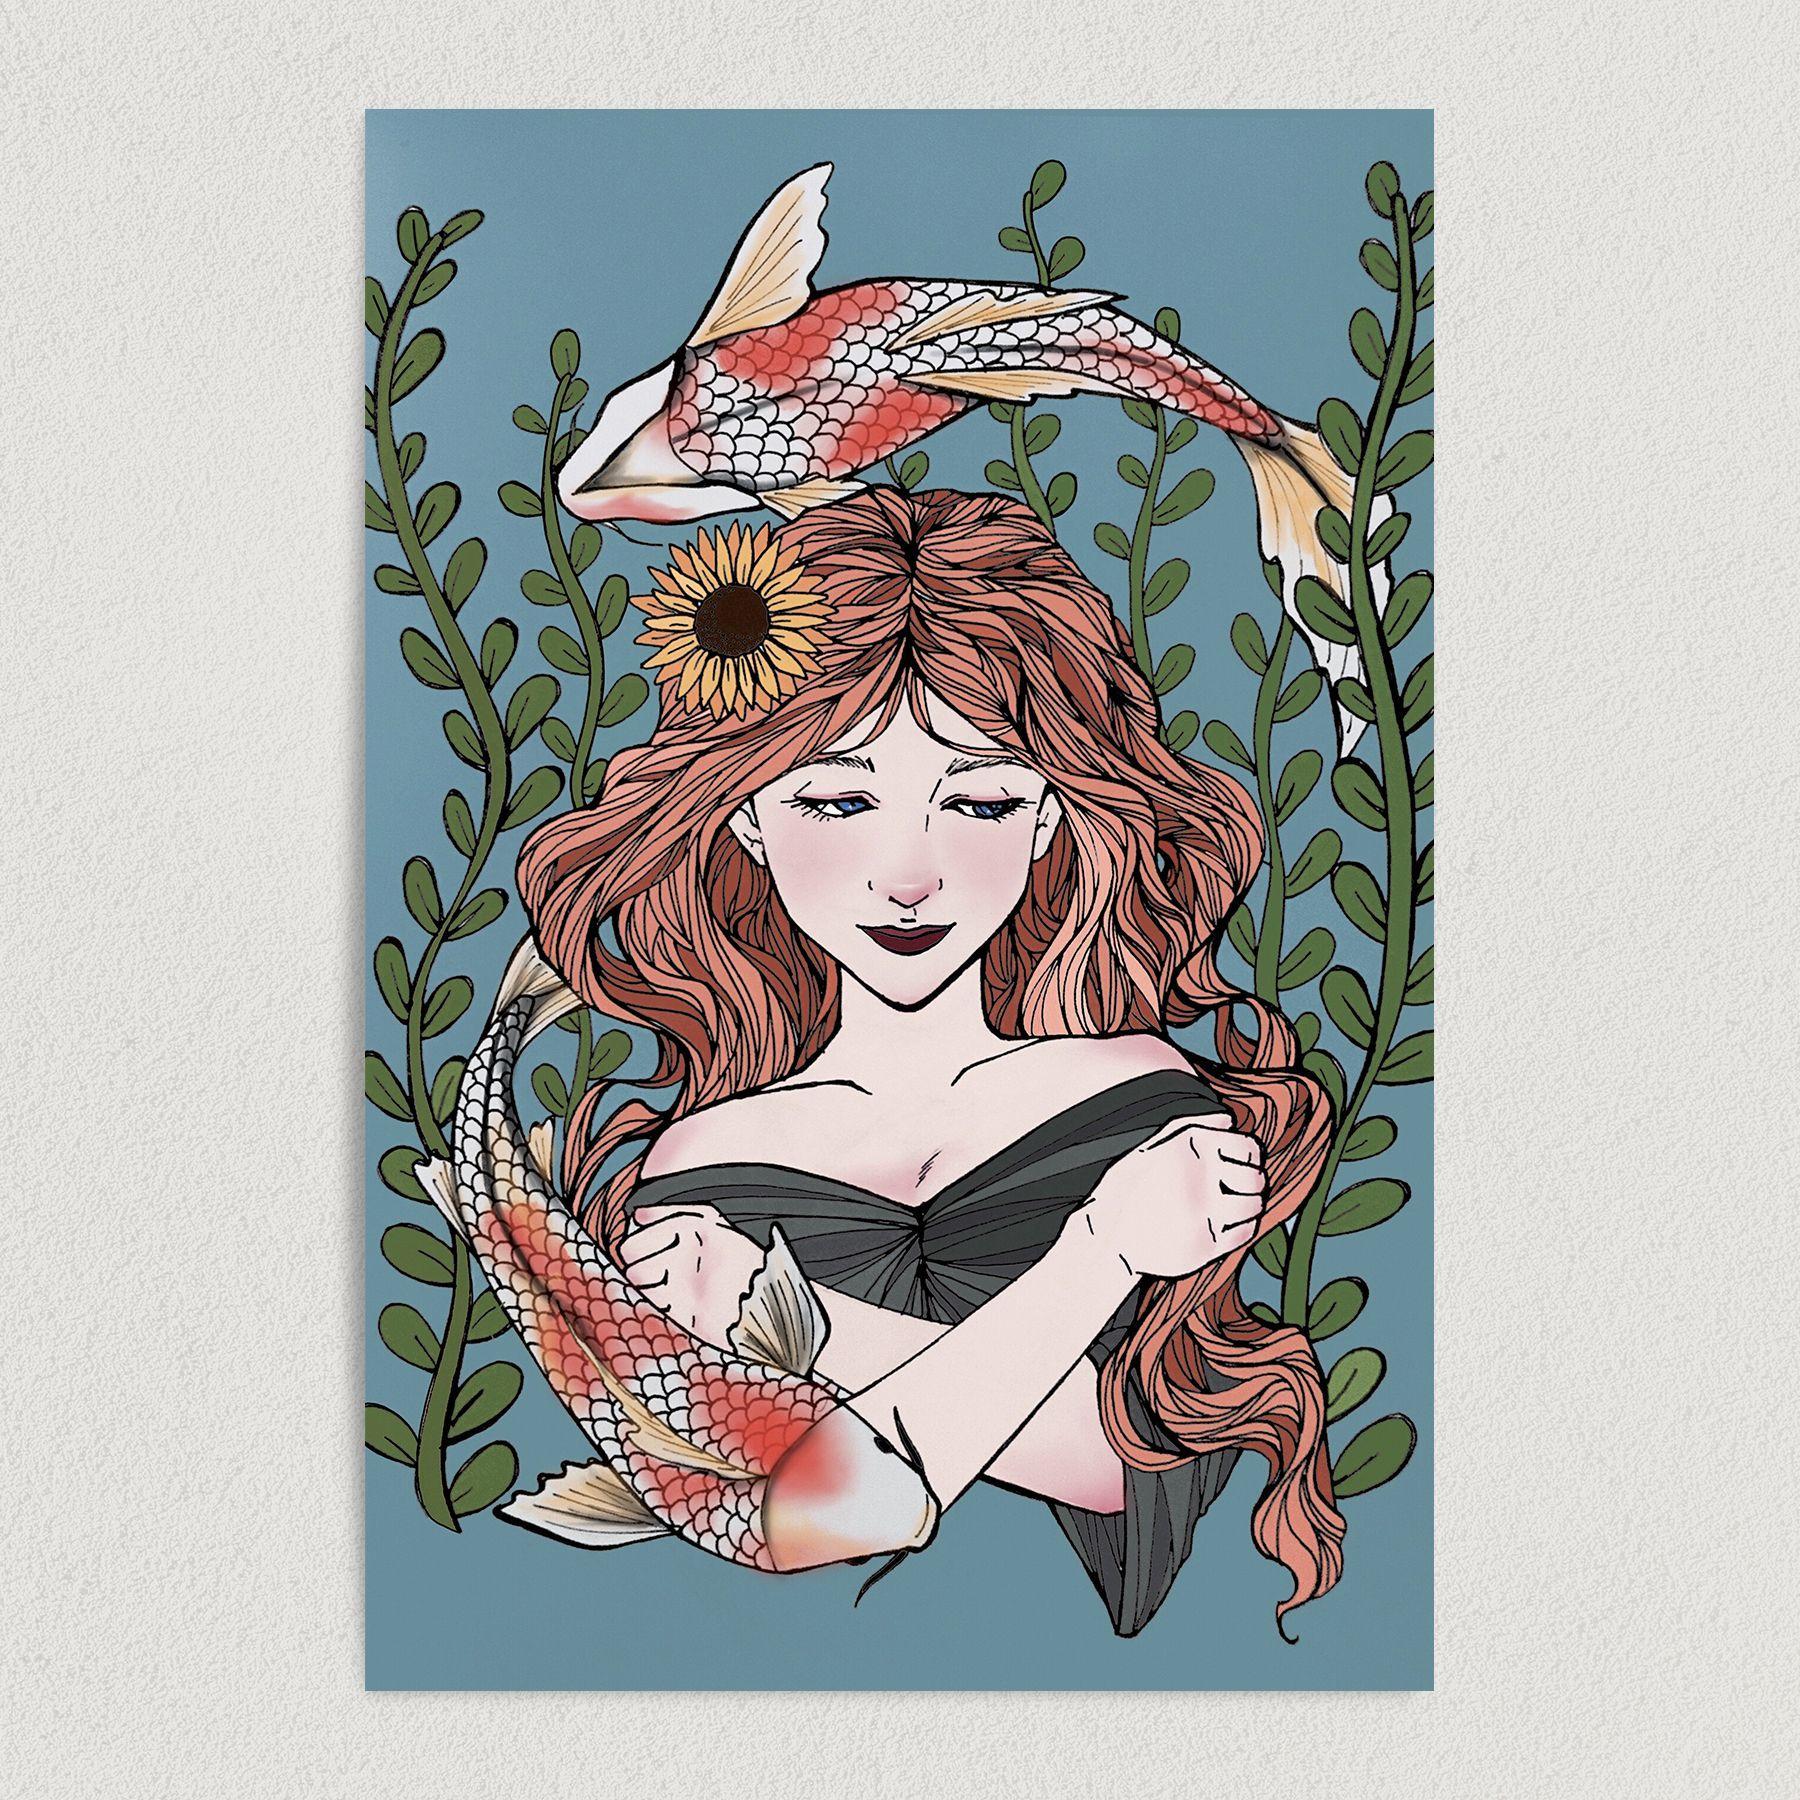 Pisces Horoscope Woman Astrology Art Print Poster AO1001